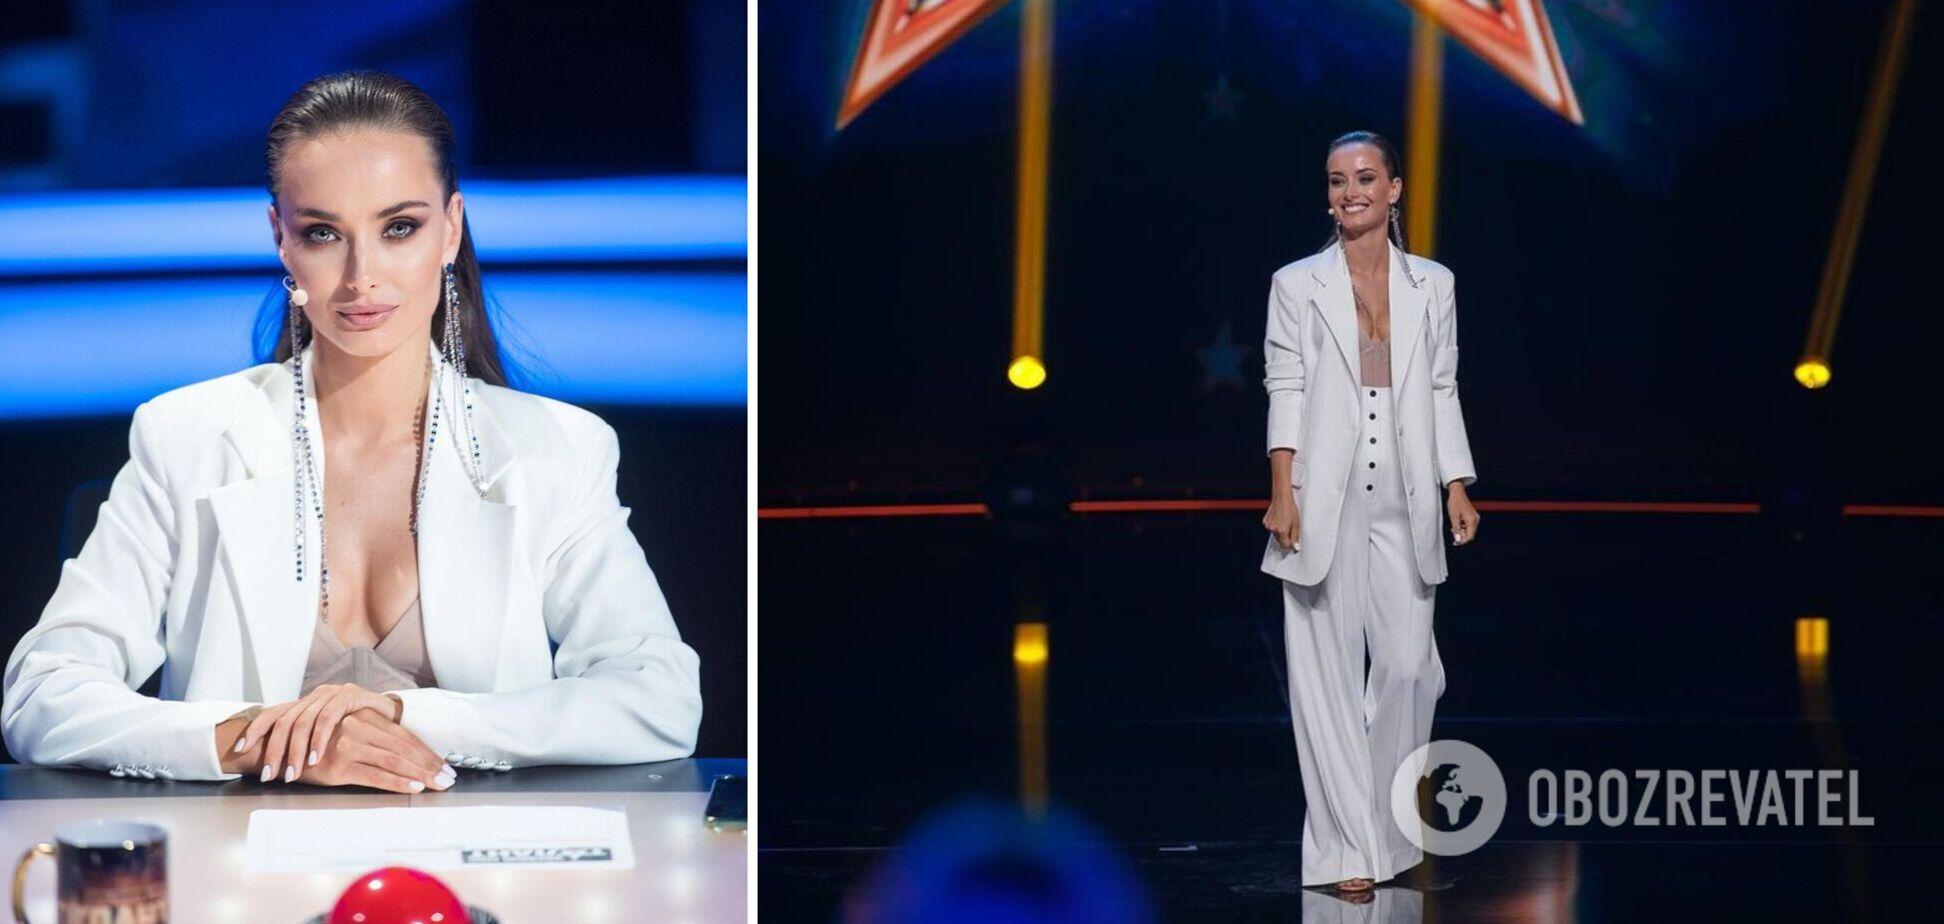 'Холостячка' Мишина о судейском кресле на талант-шоу: ярко, мощно и сложно